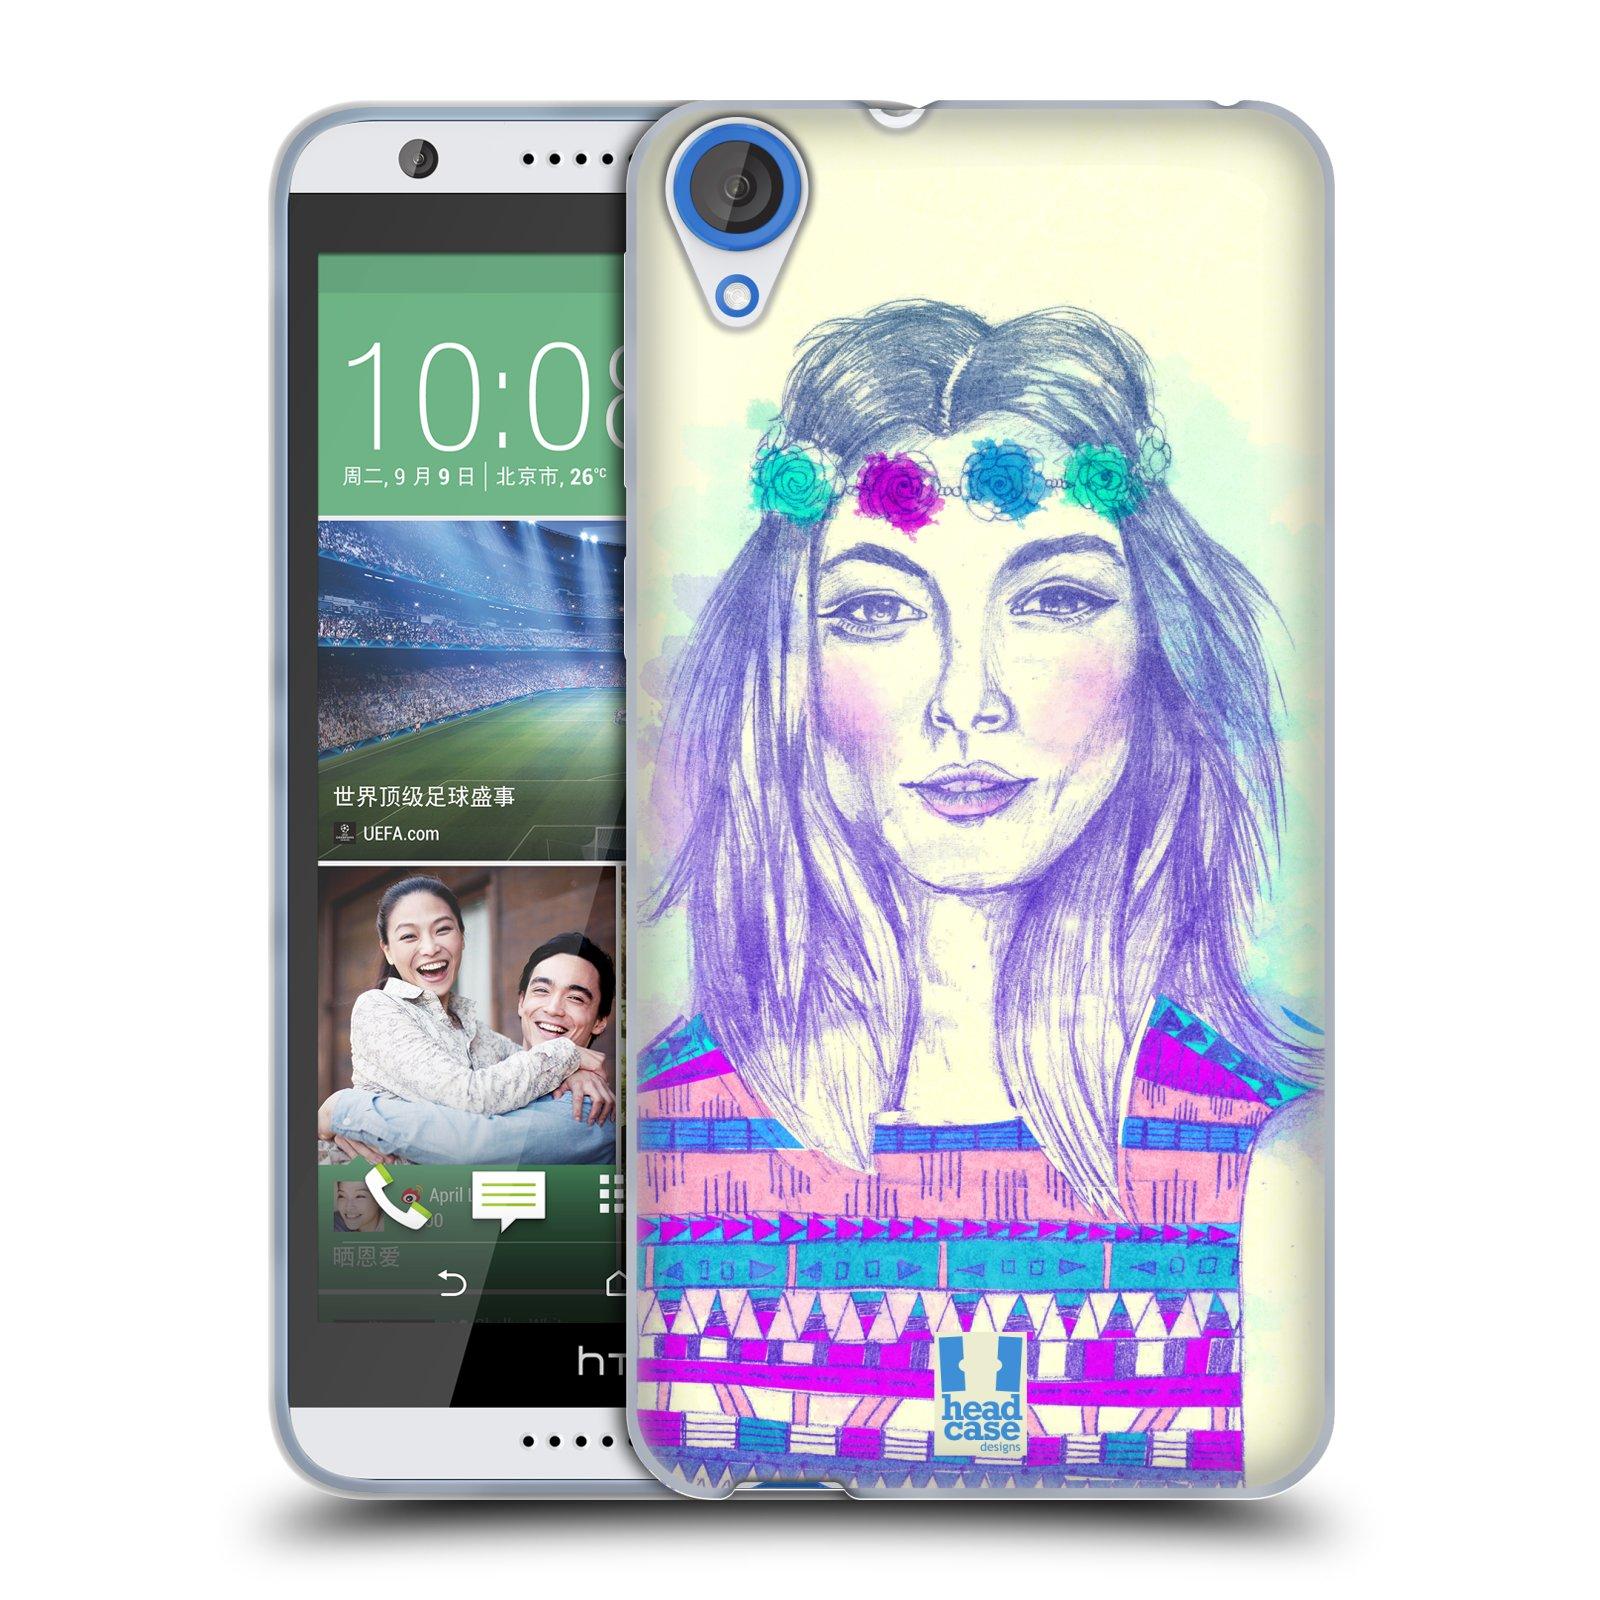 HEAD CASE silikonový obal na mobil HTC DESIRE 820 vzor Dívka dlouhé květinové vlasy HIPPIE modrá